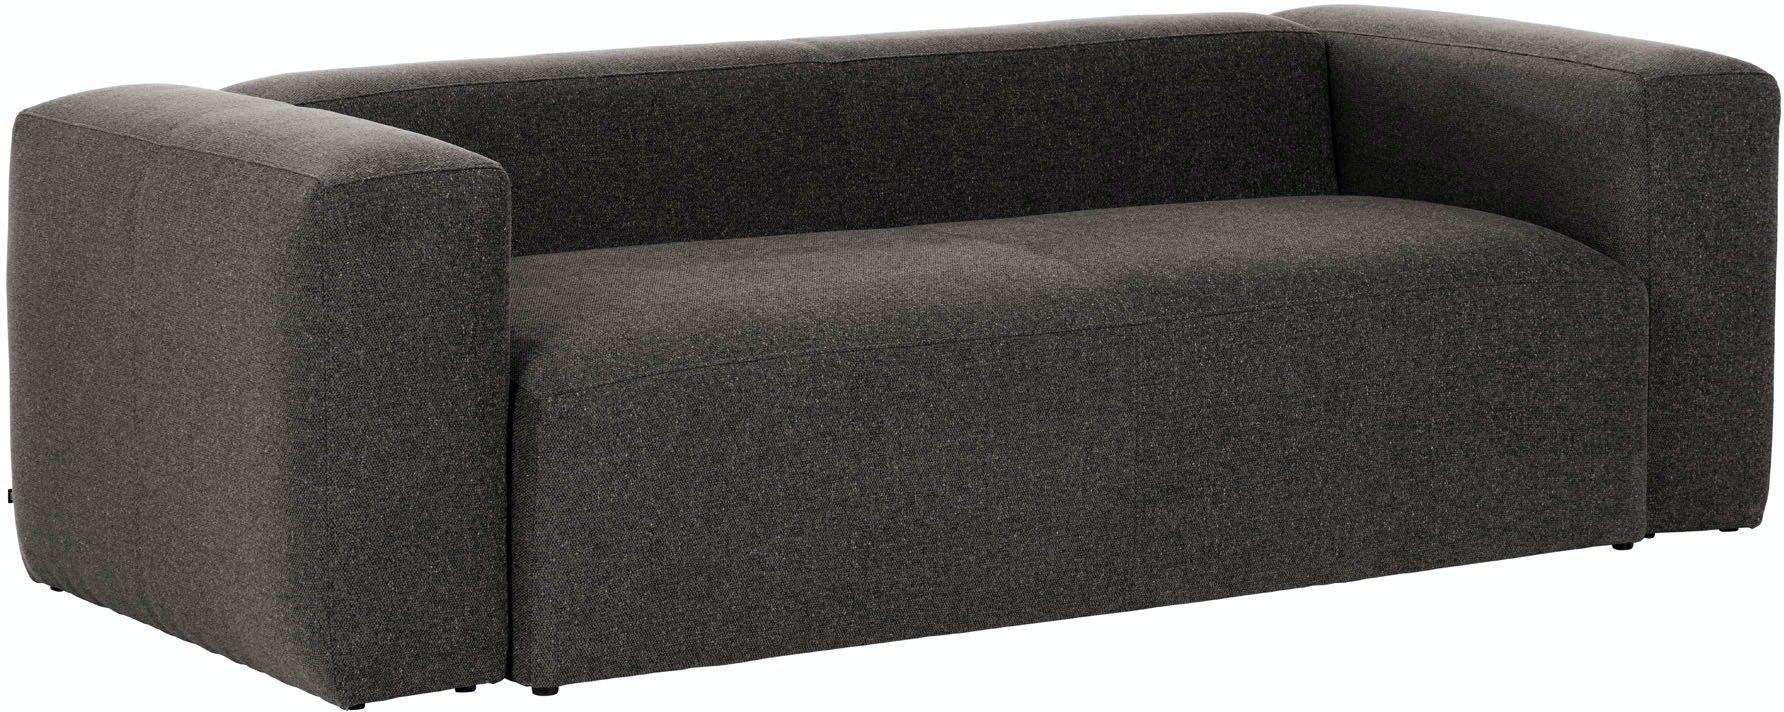 Blok, 3-personers sofa, Stof by LaForma (H: 69 cm. B: 240 cm. L: 100 cm., Grå)